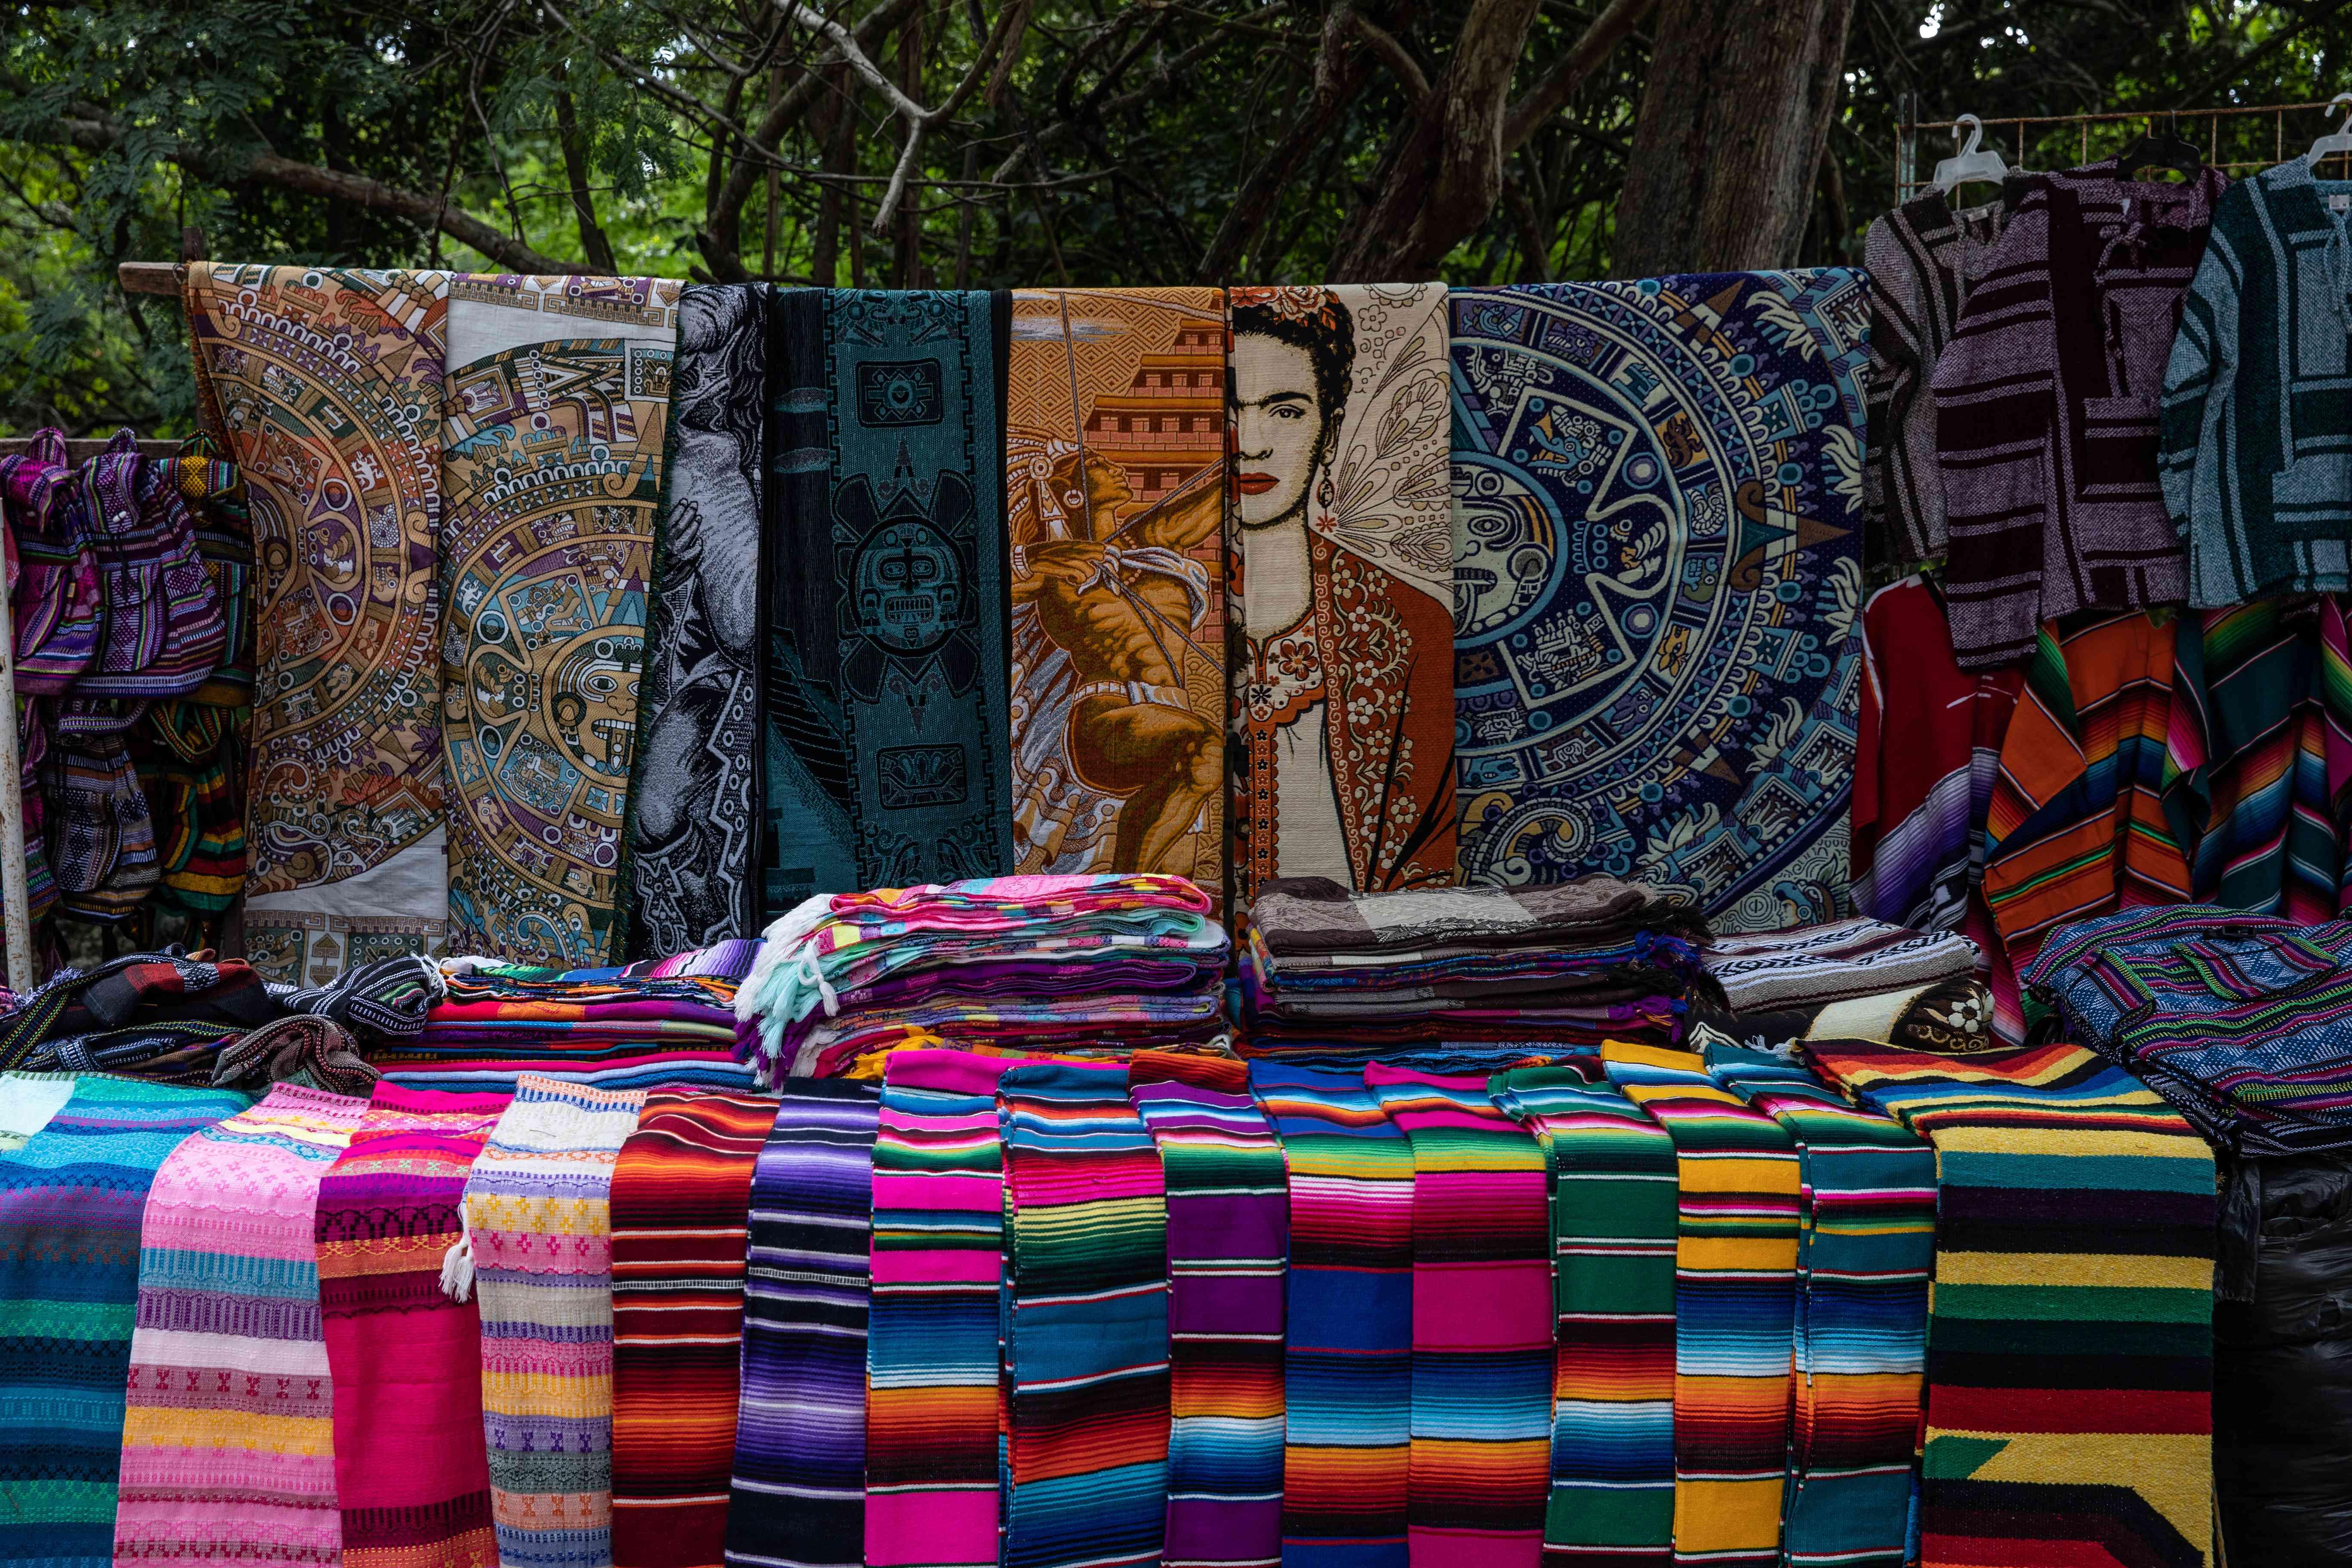 Handicraft souvenirs in Mexico